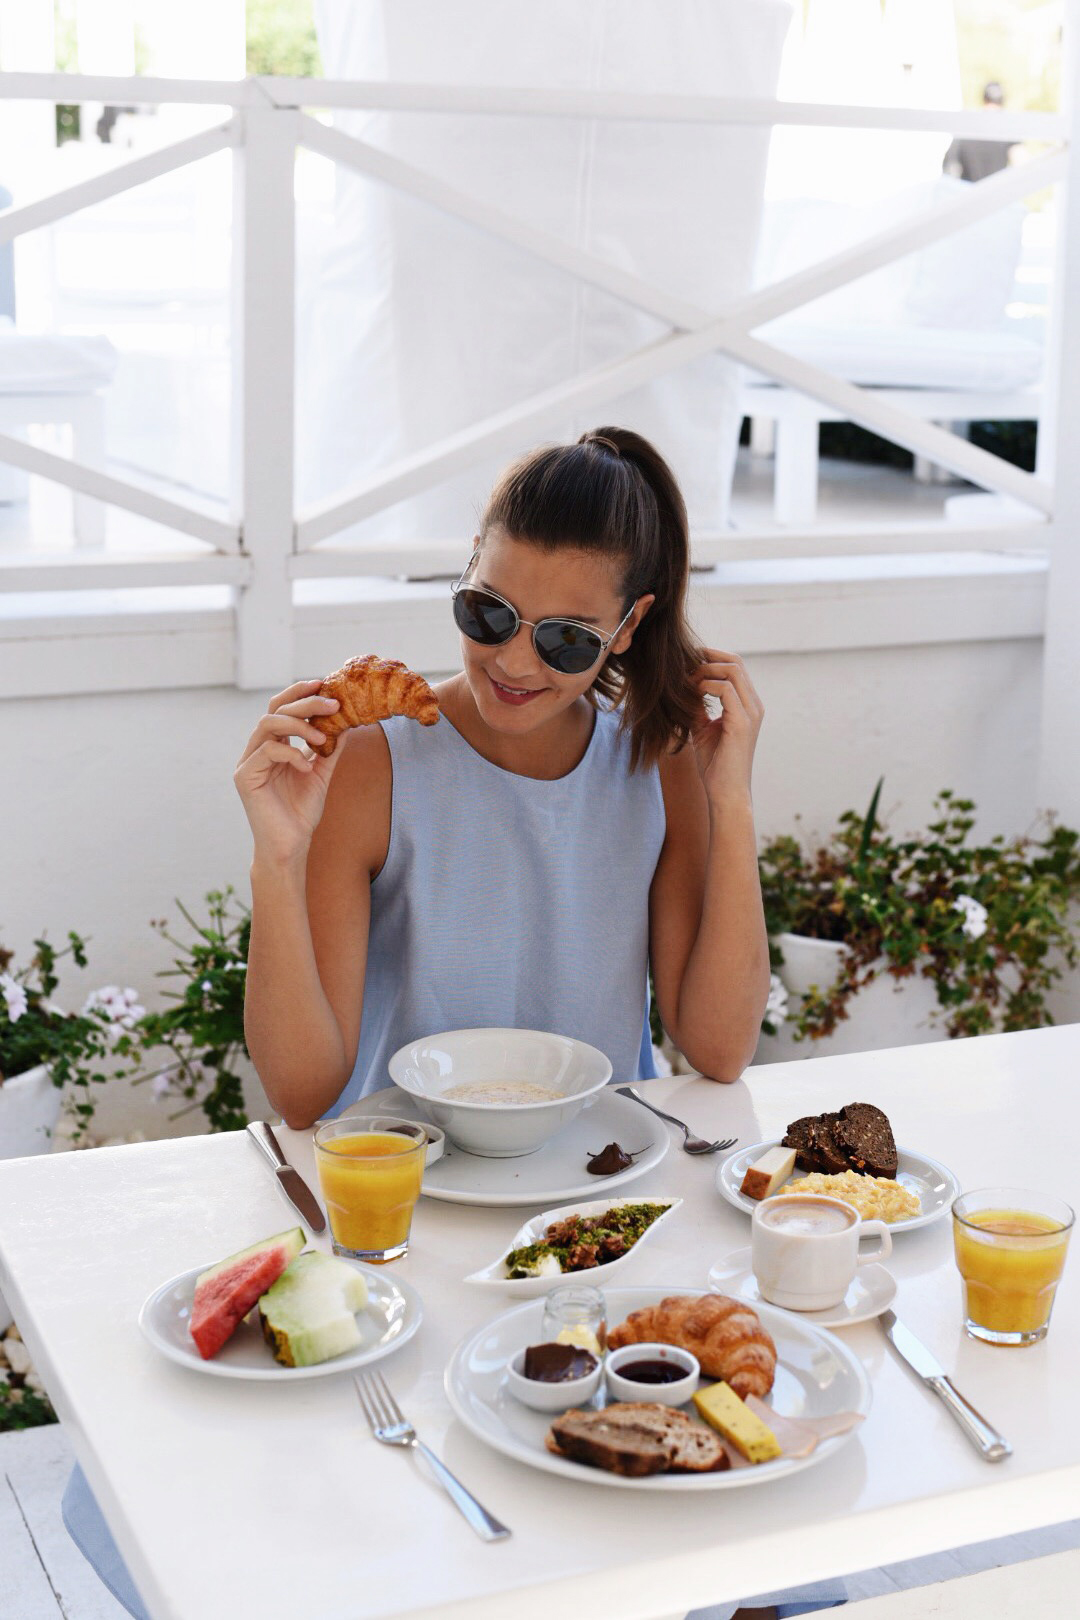 hillside-beach-club-hotel-fruehstuecks-buffet-fashiioncarpet